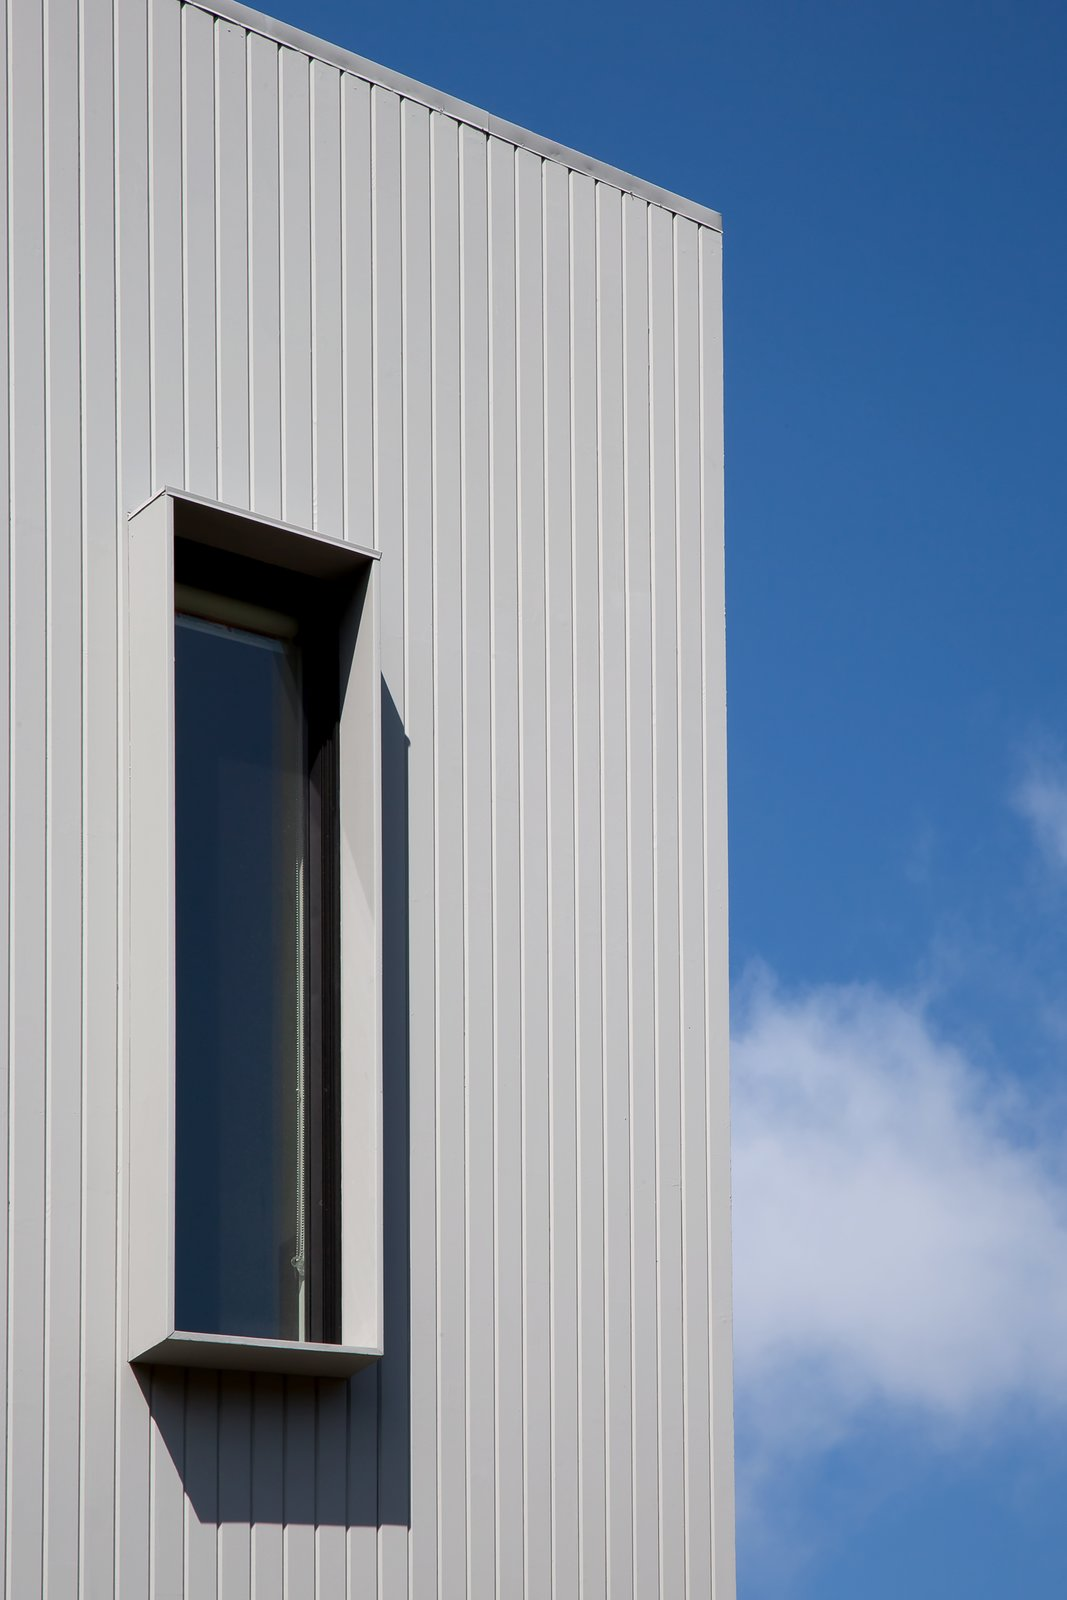 Rear window  27th Street - Noe Valley by patrick perez/designpad architecture